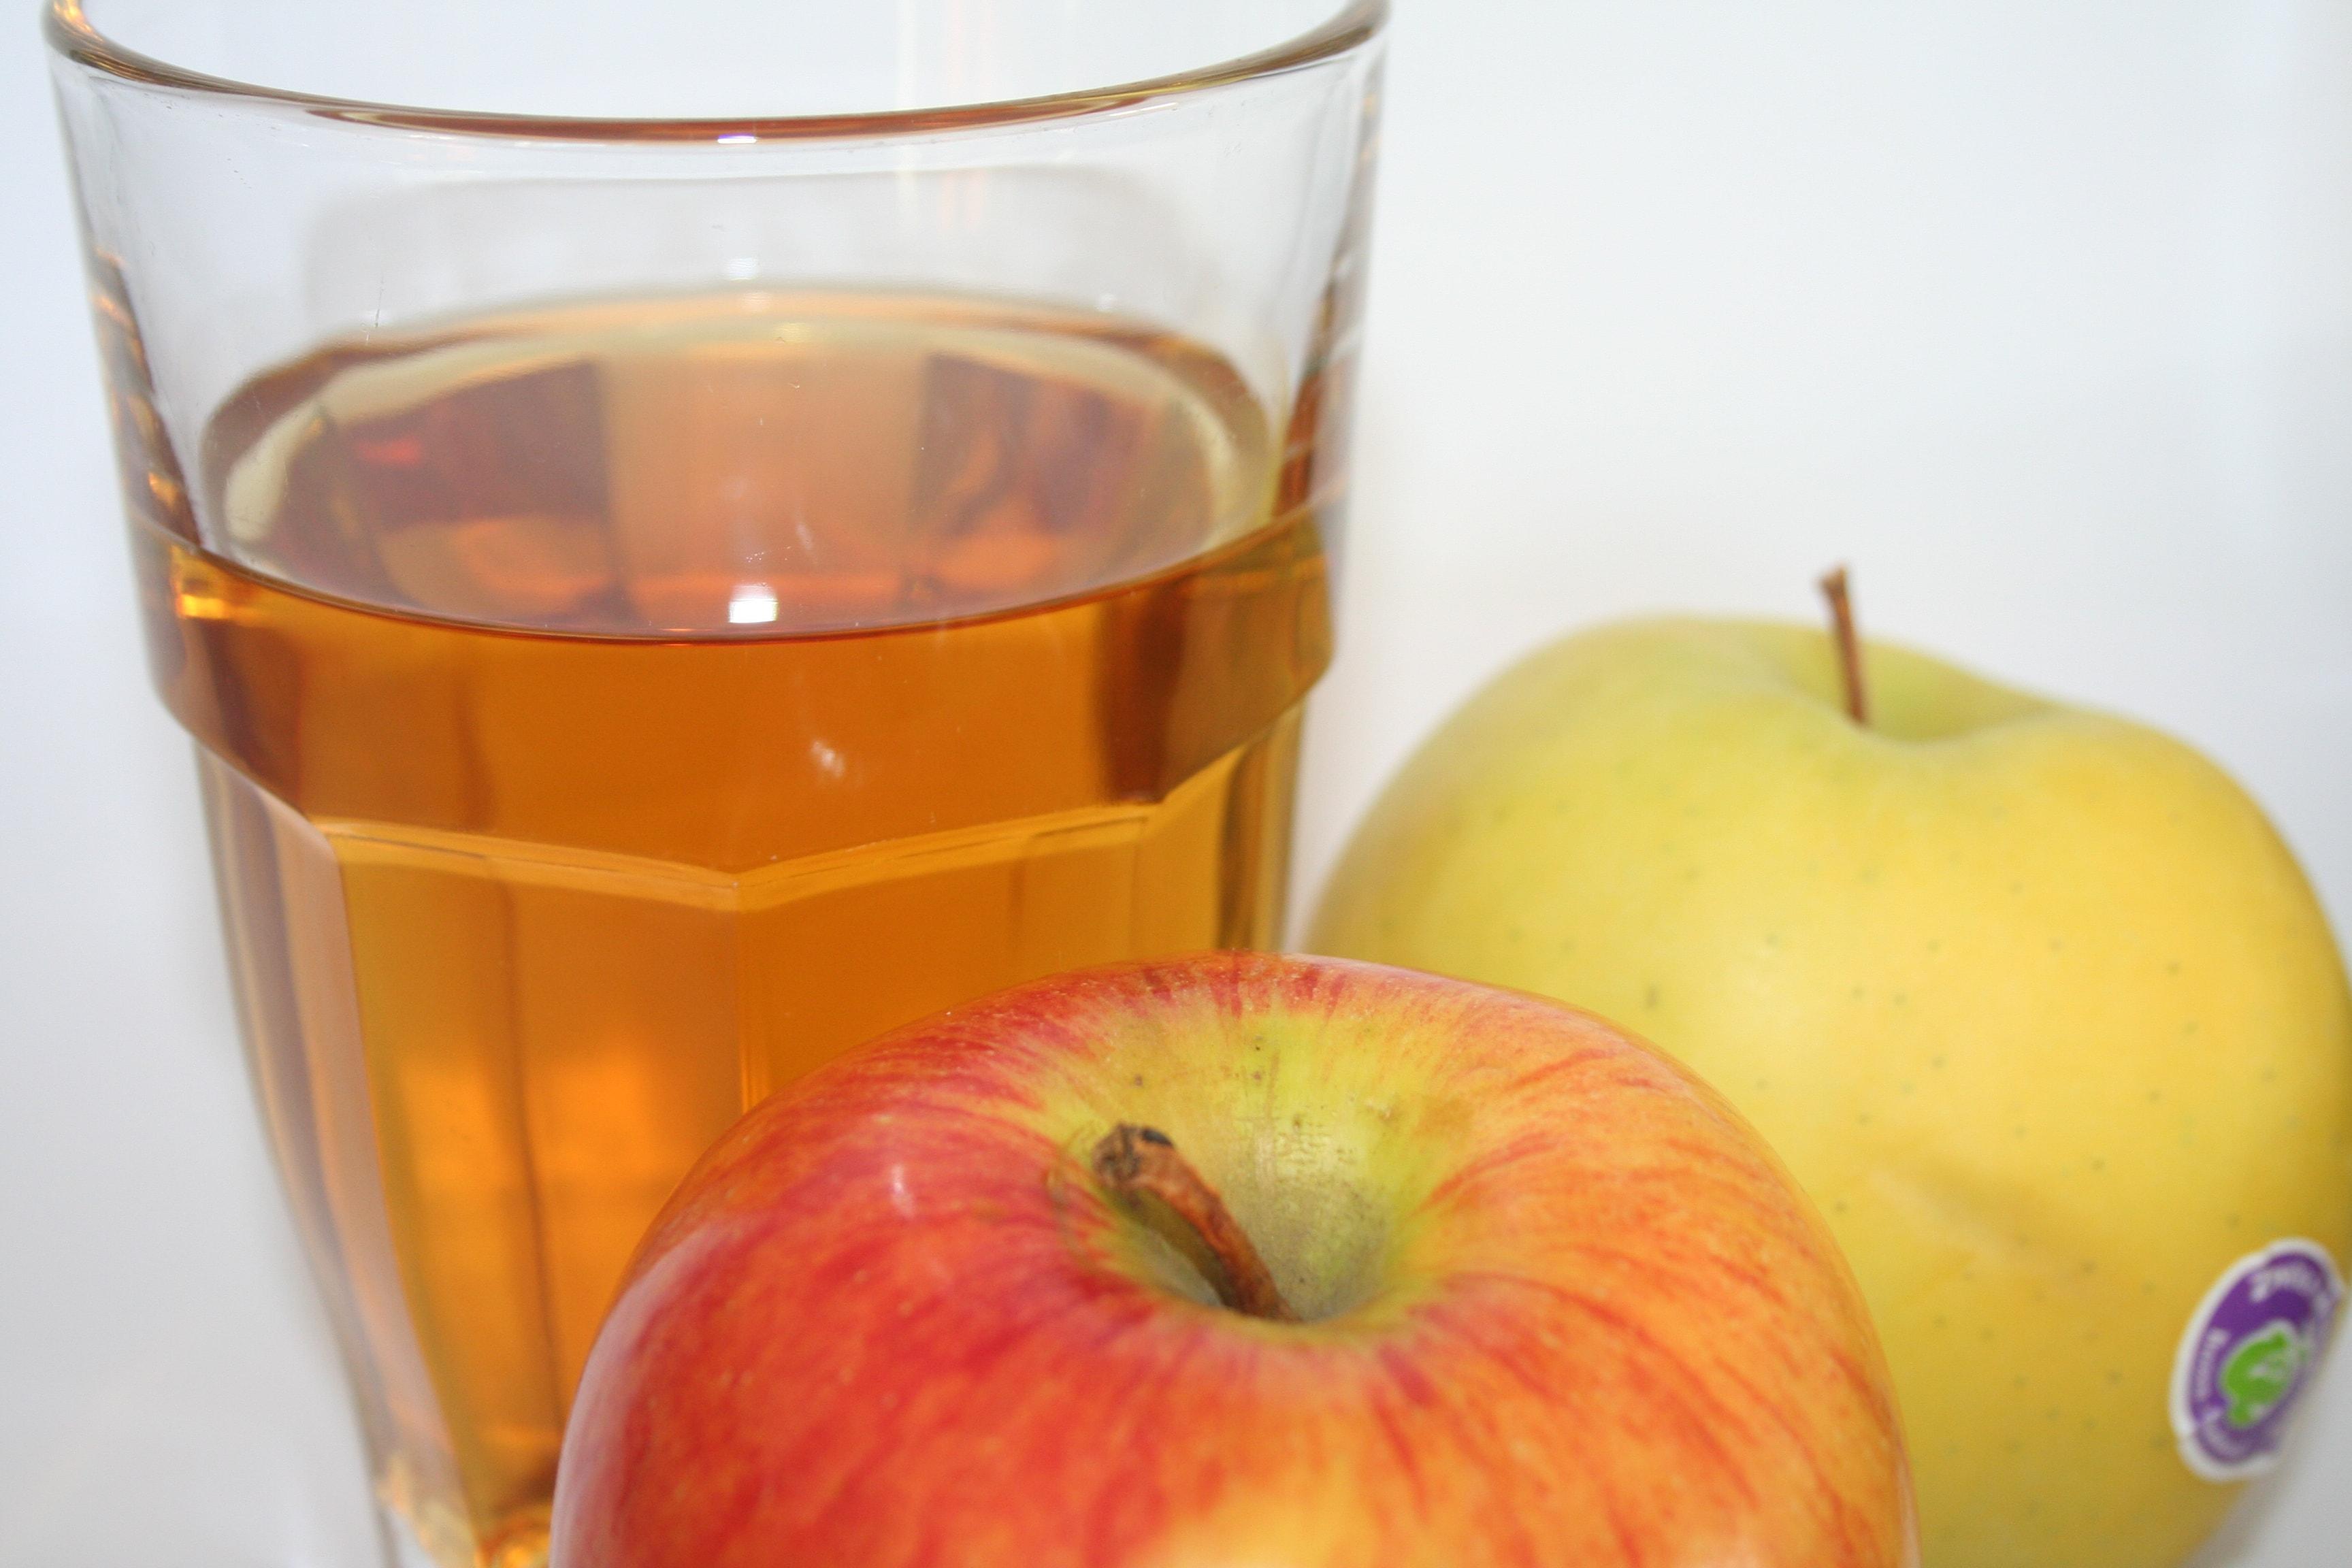 Orangen Trunk, Brauerei Rapp - Kalorien - Nährwerte